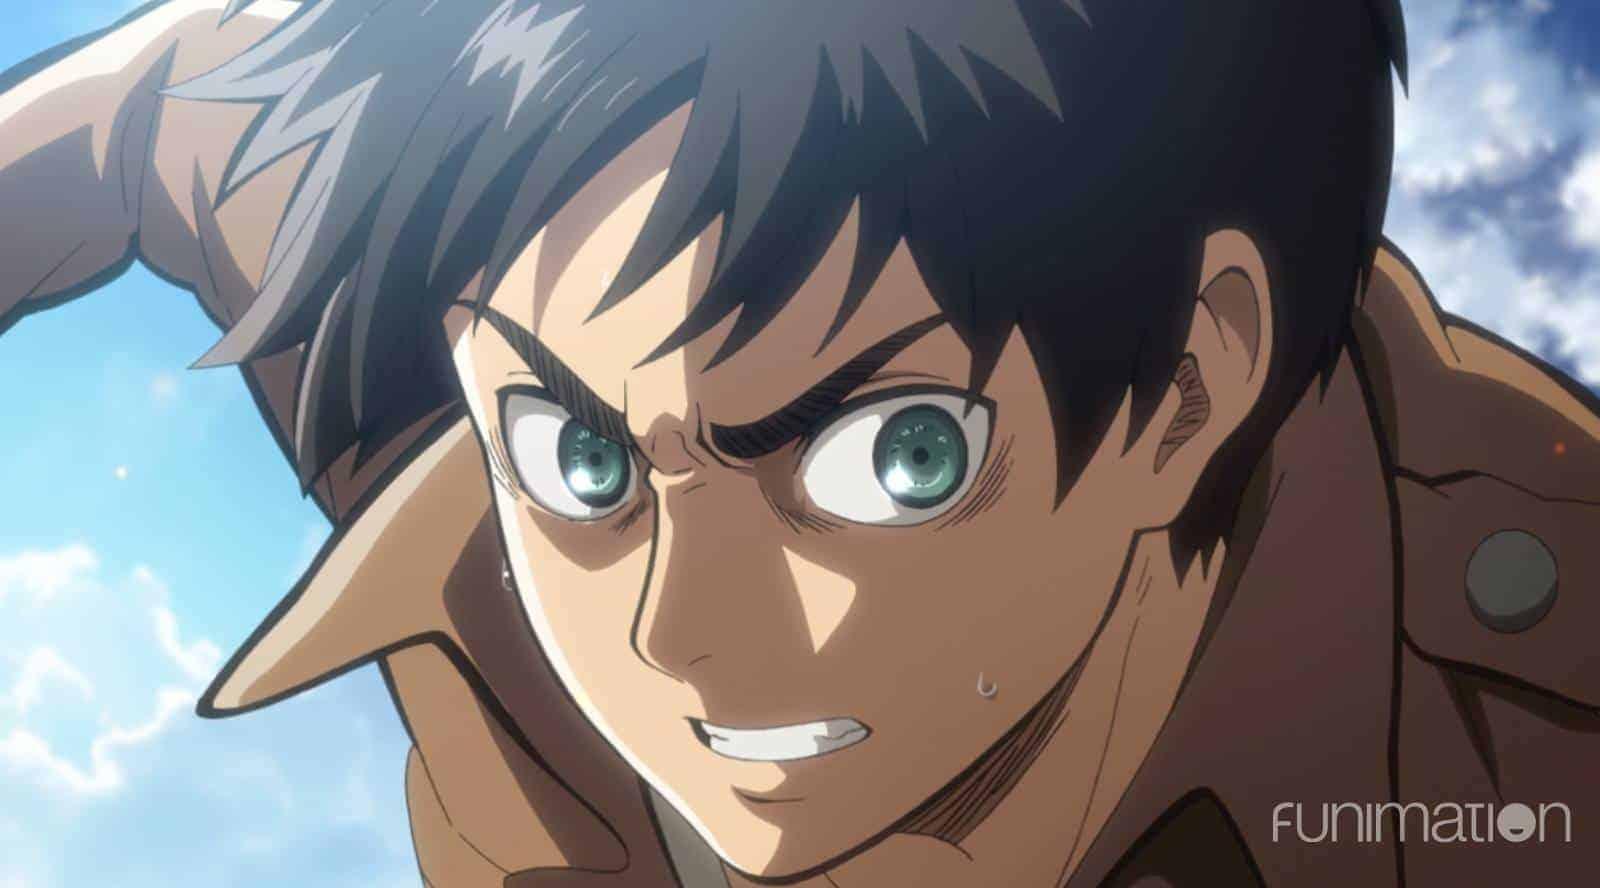 Attack On Titan Funimation